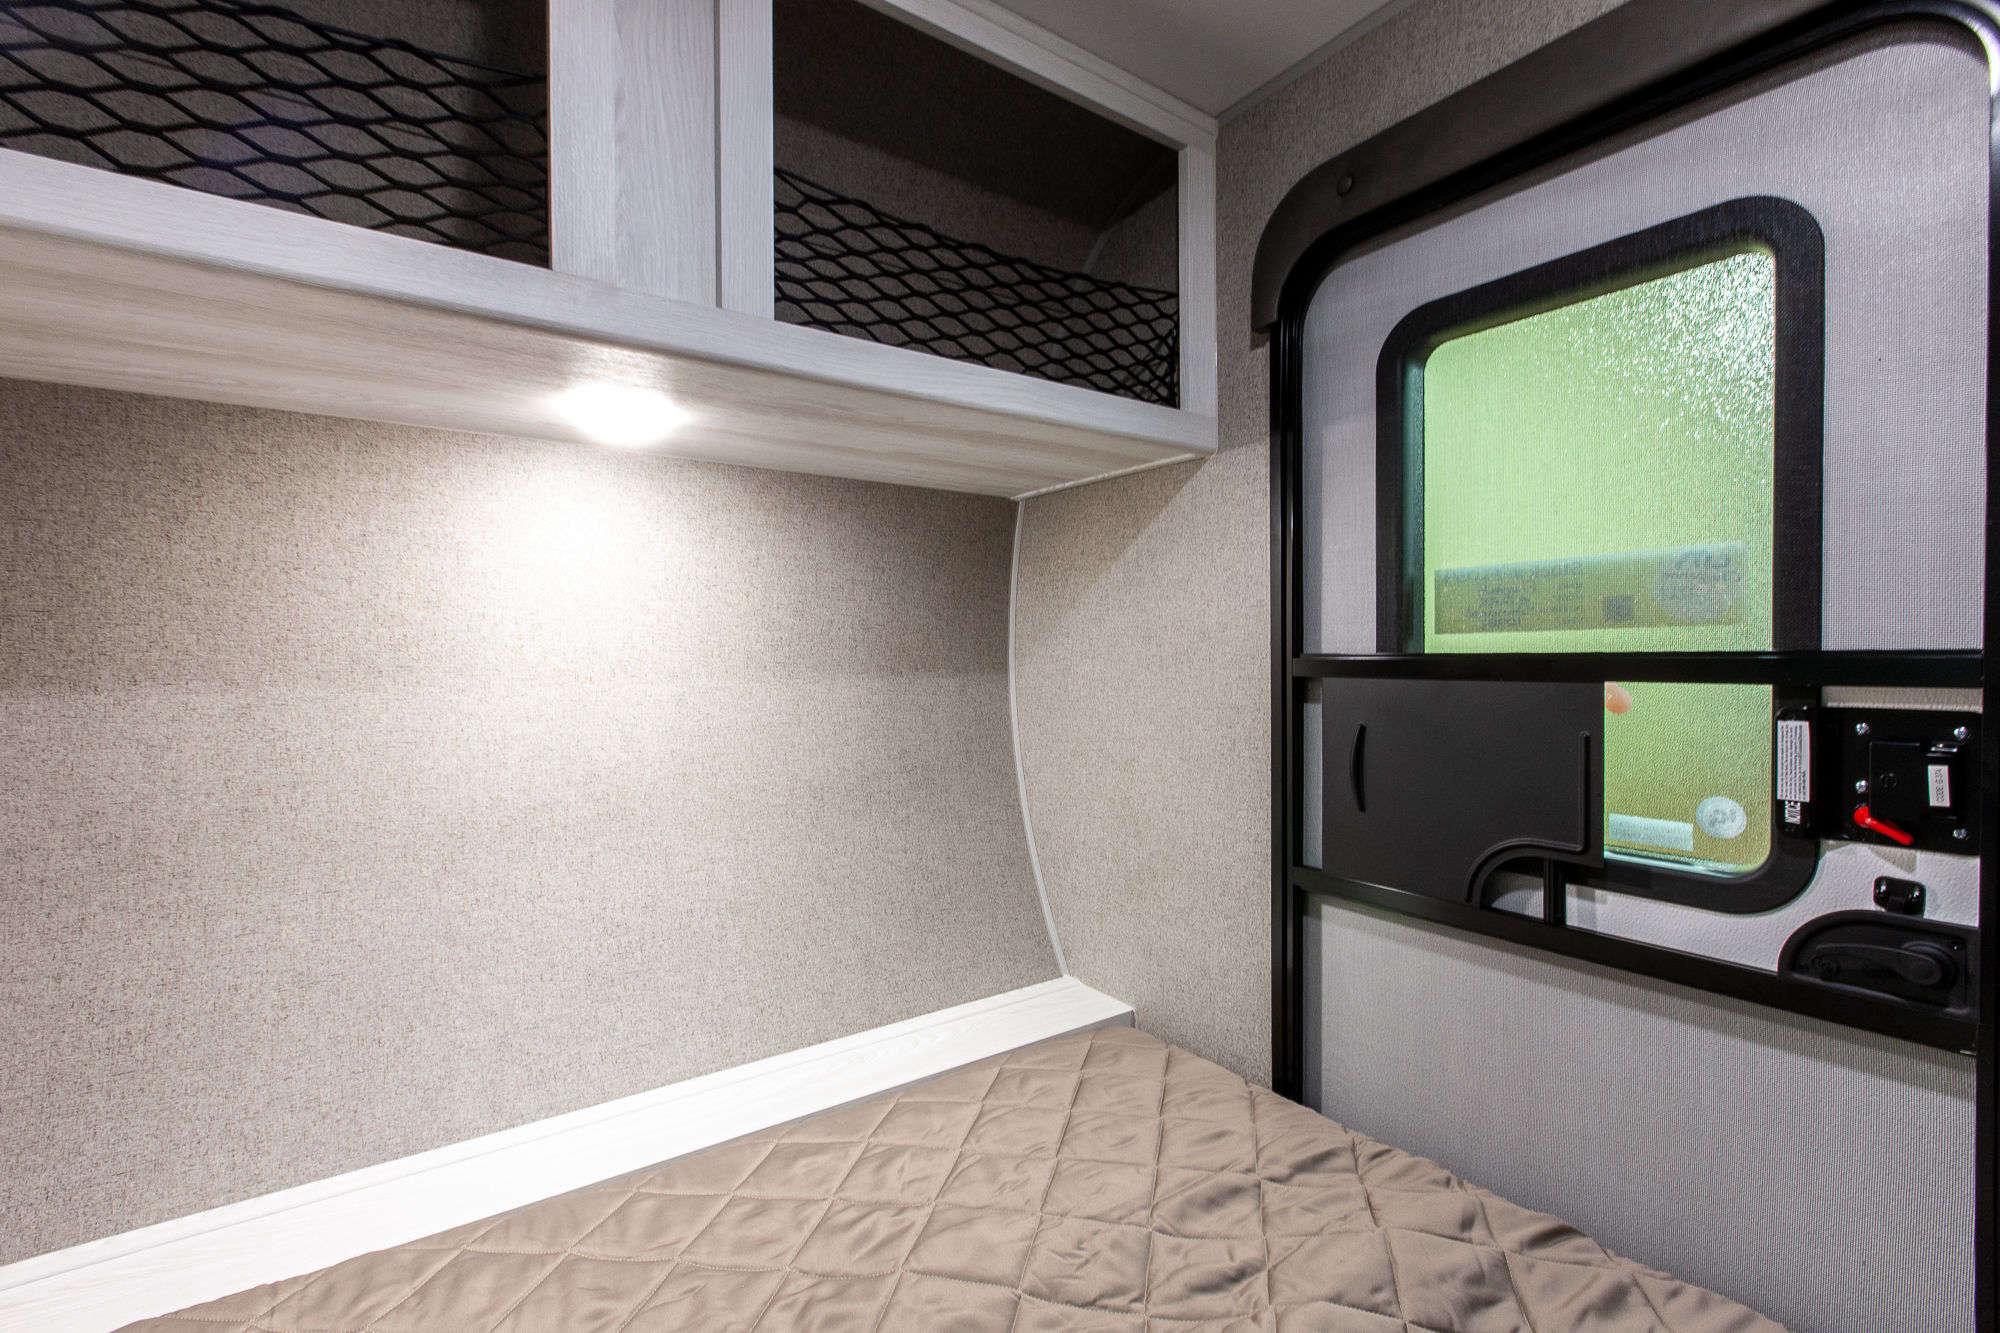 2021 Forest River Flagstaff E-Pro E12RK Travel Trailer Interior Image